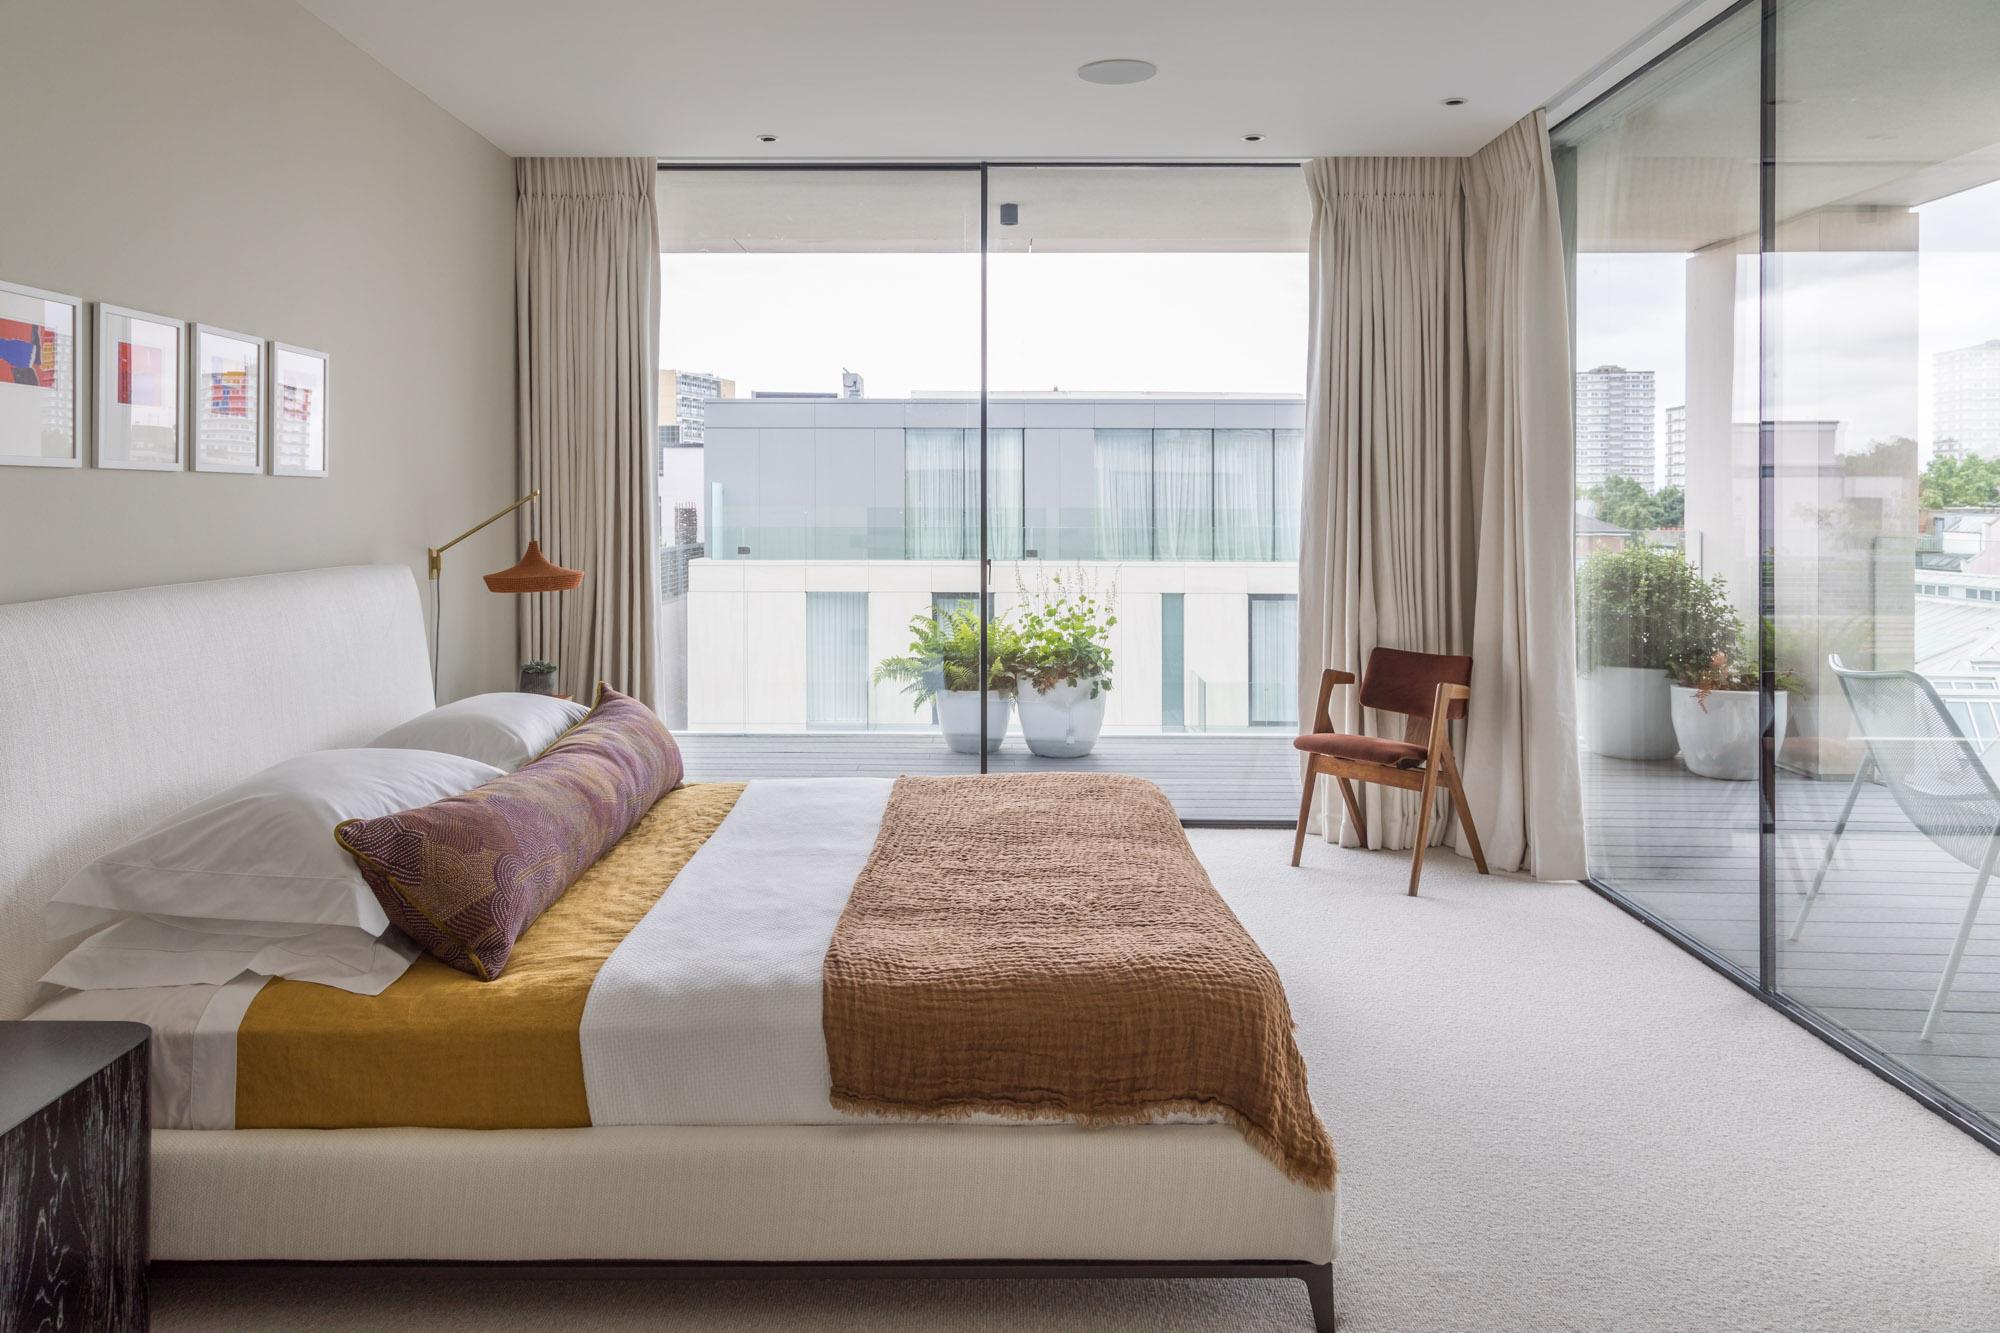 jonathan bond, interior photographer, double bed in bedroom, battersea, london